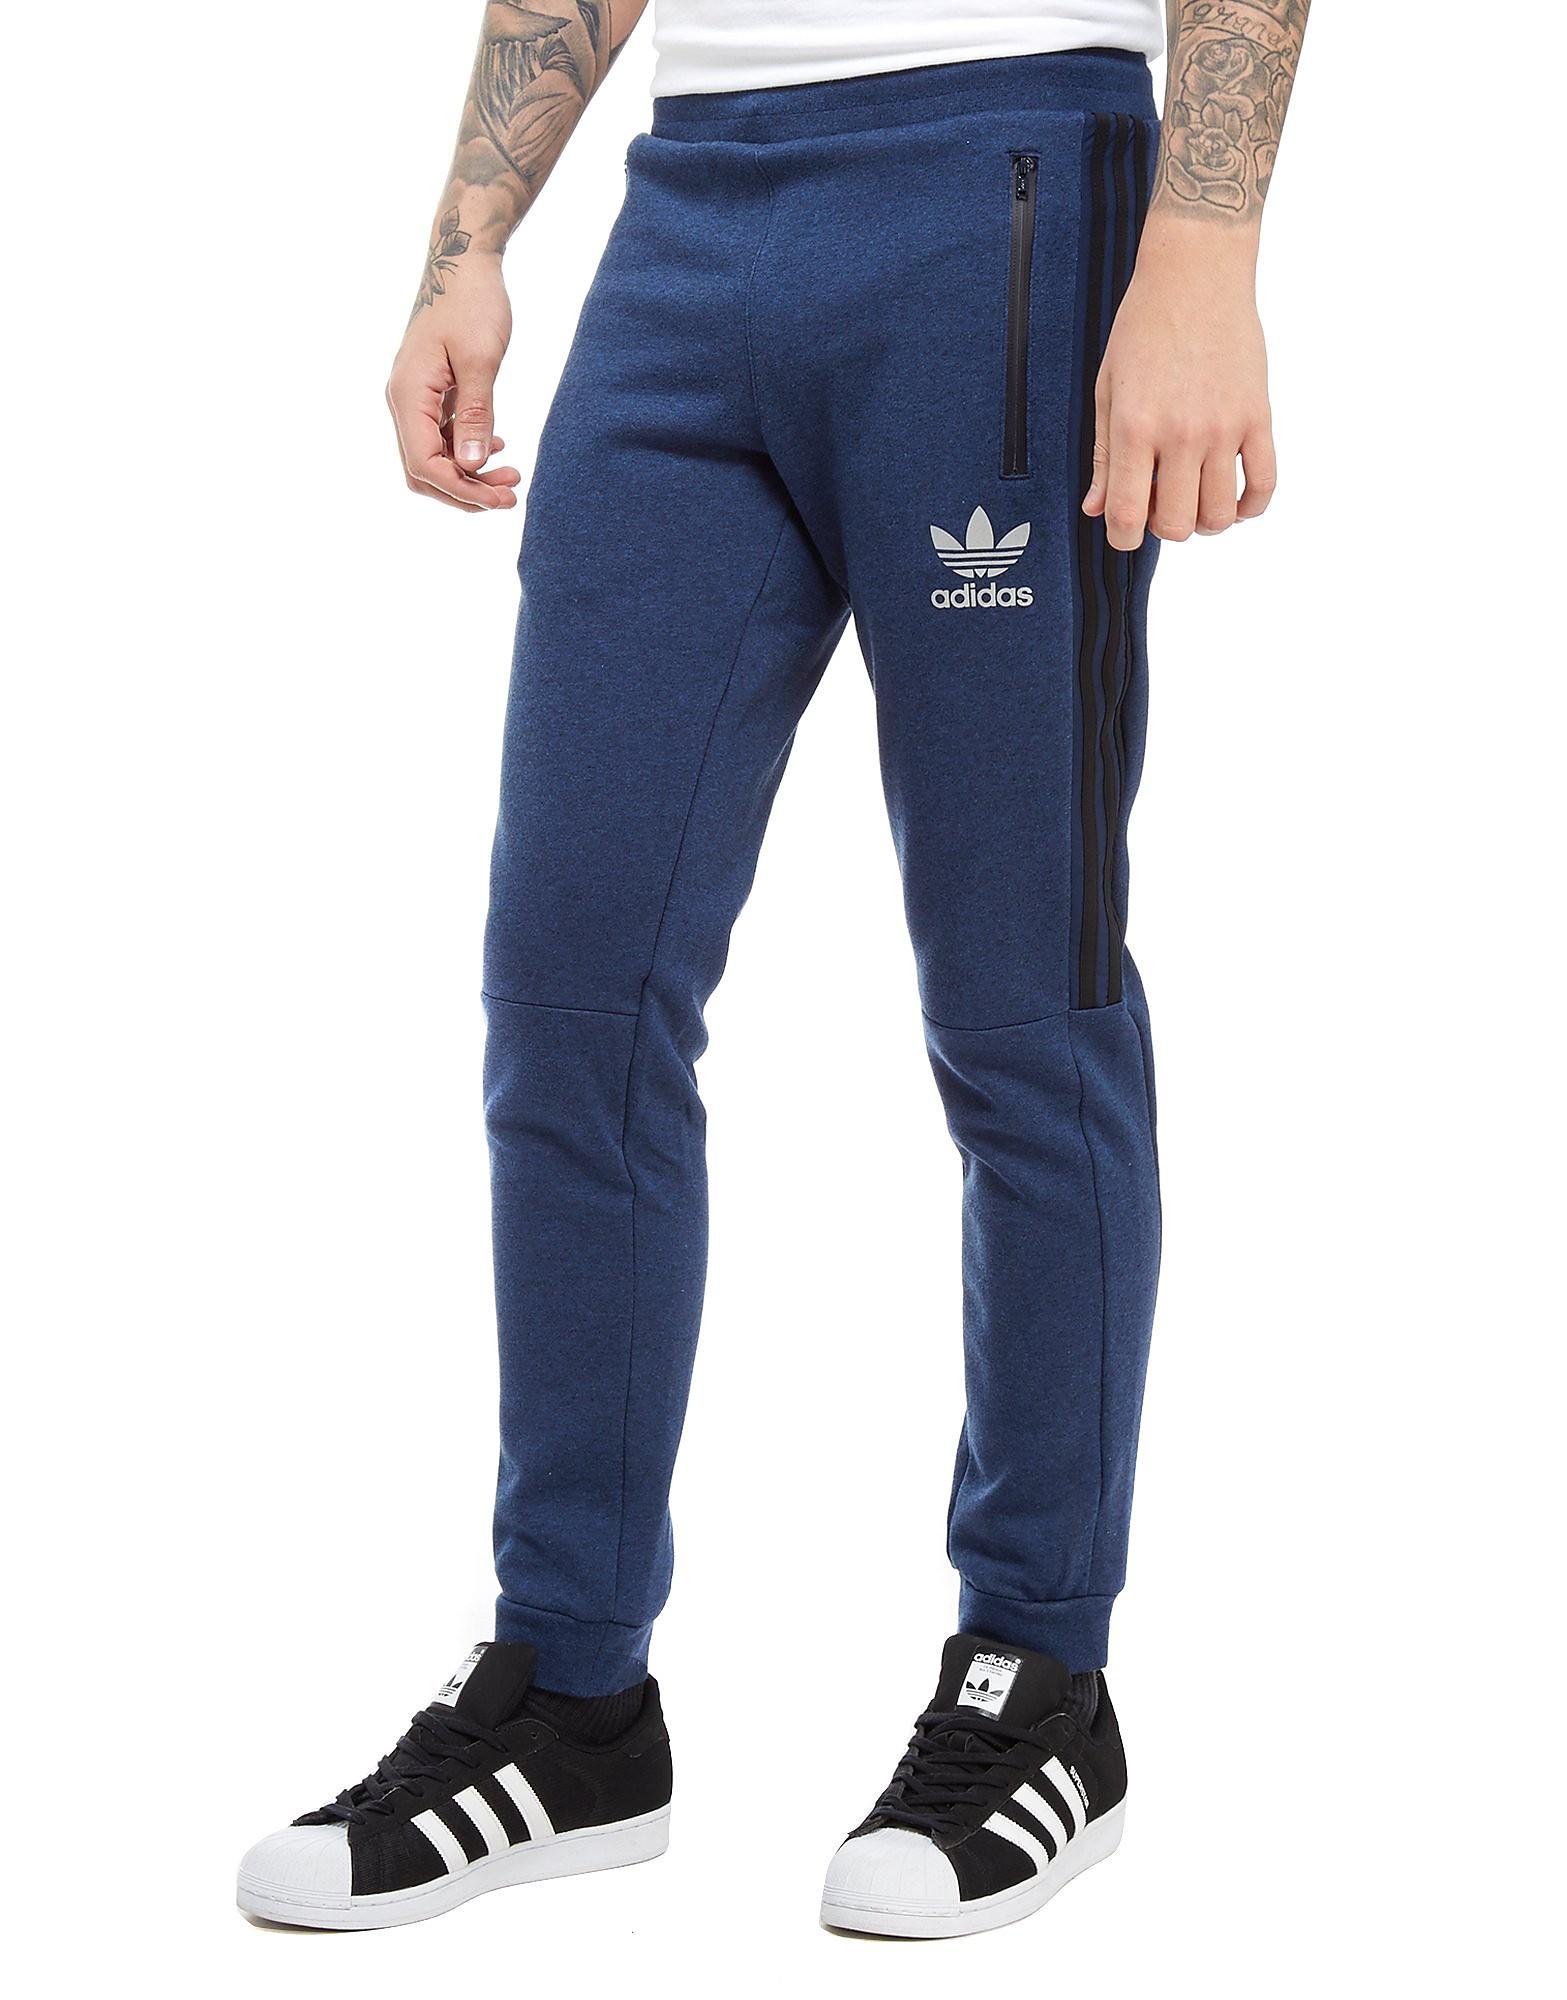 adidas Originals Pantalon de survêtement Street Run Homme